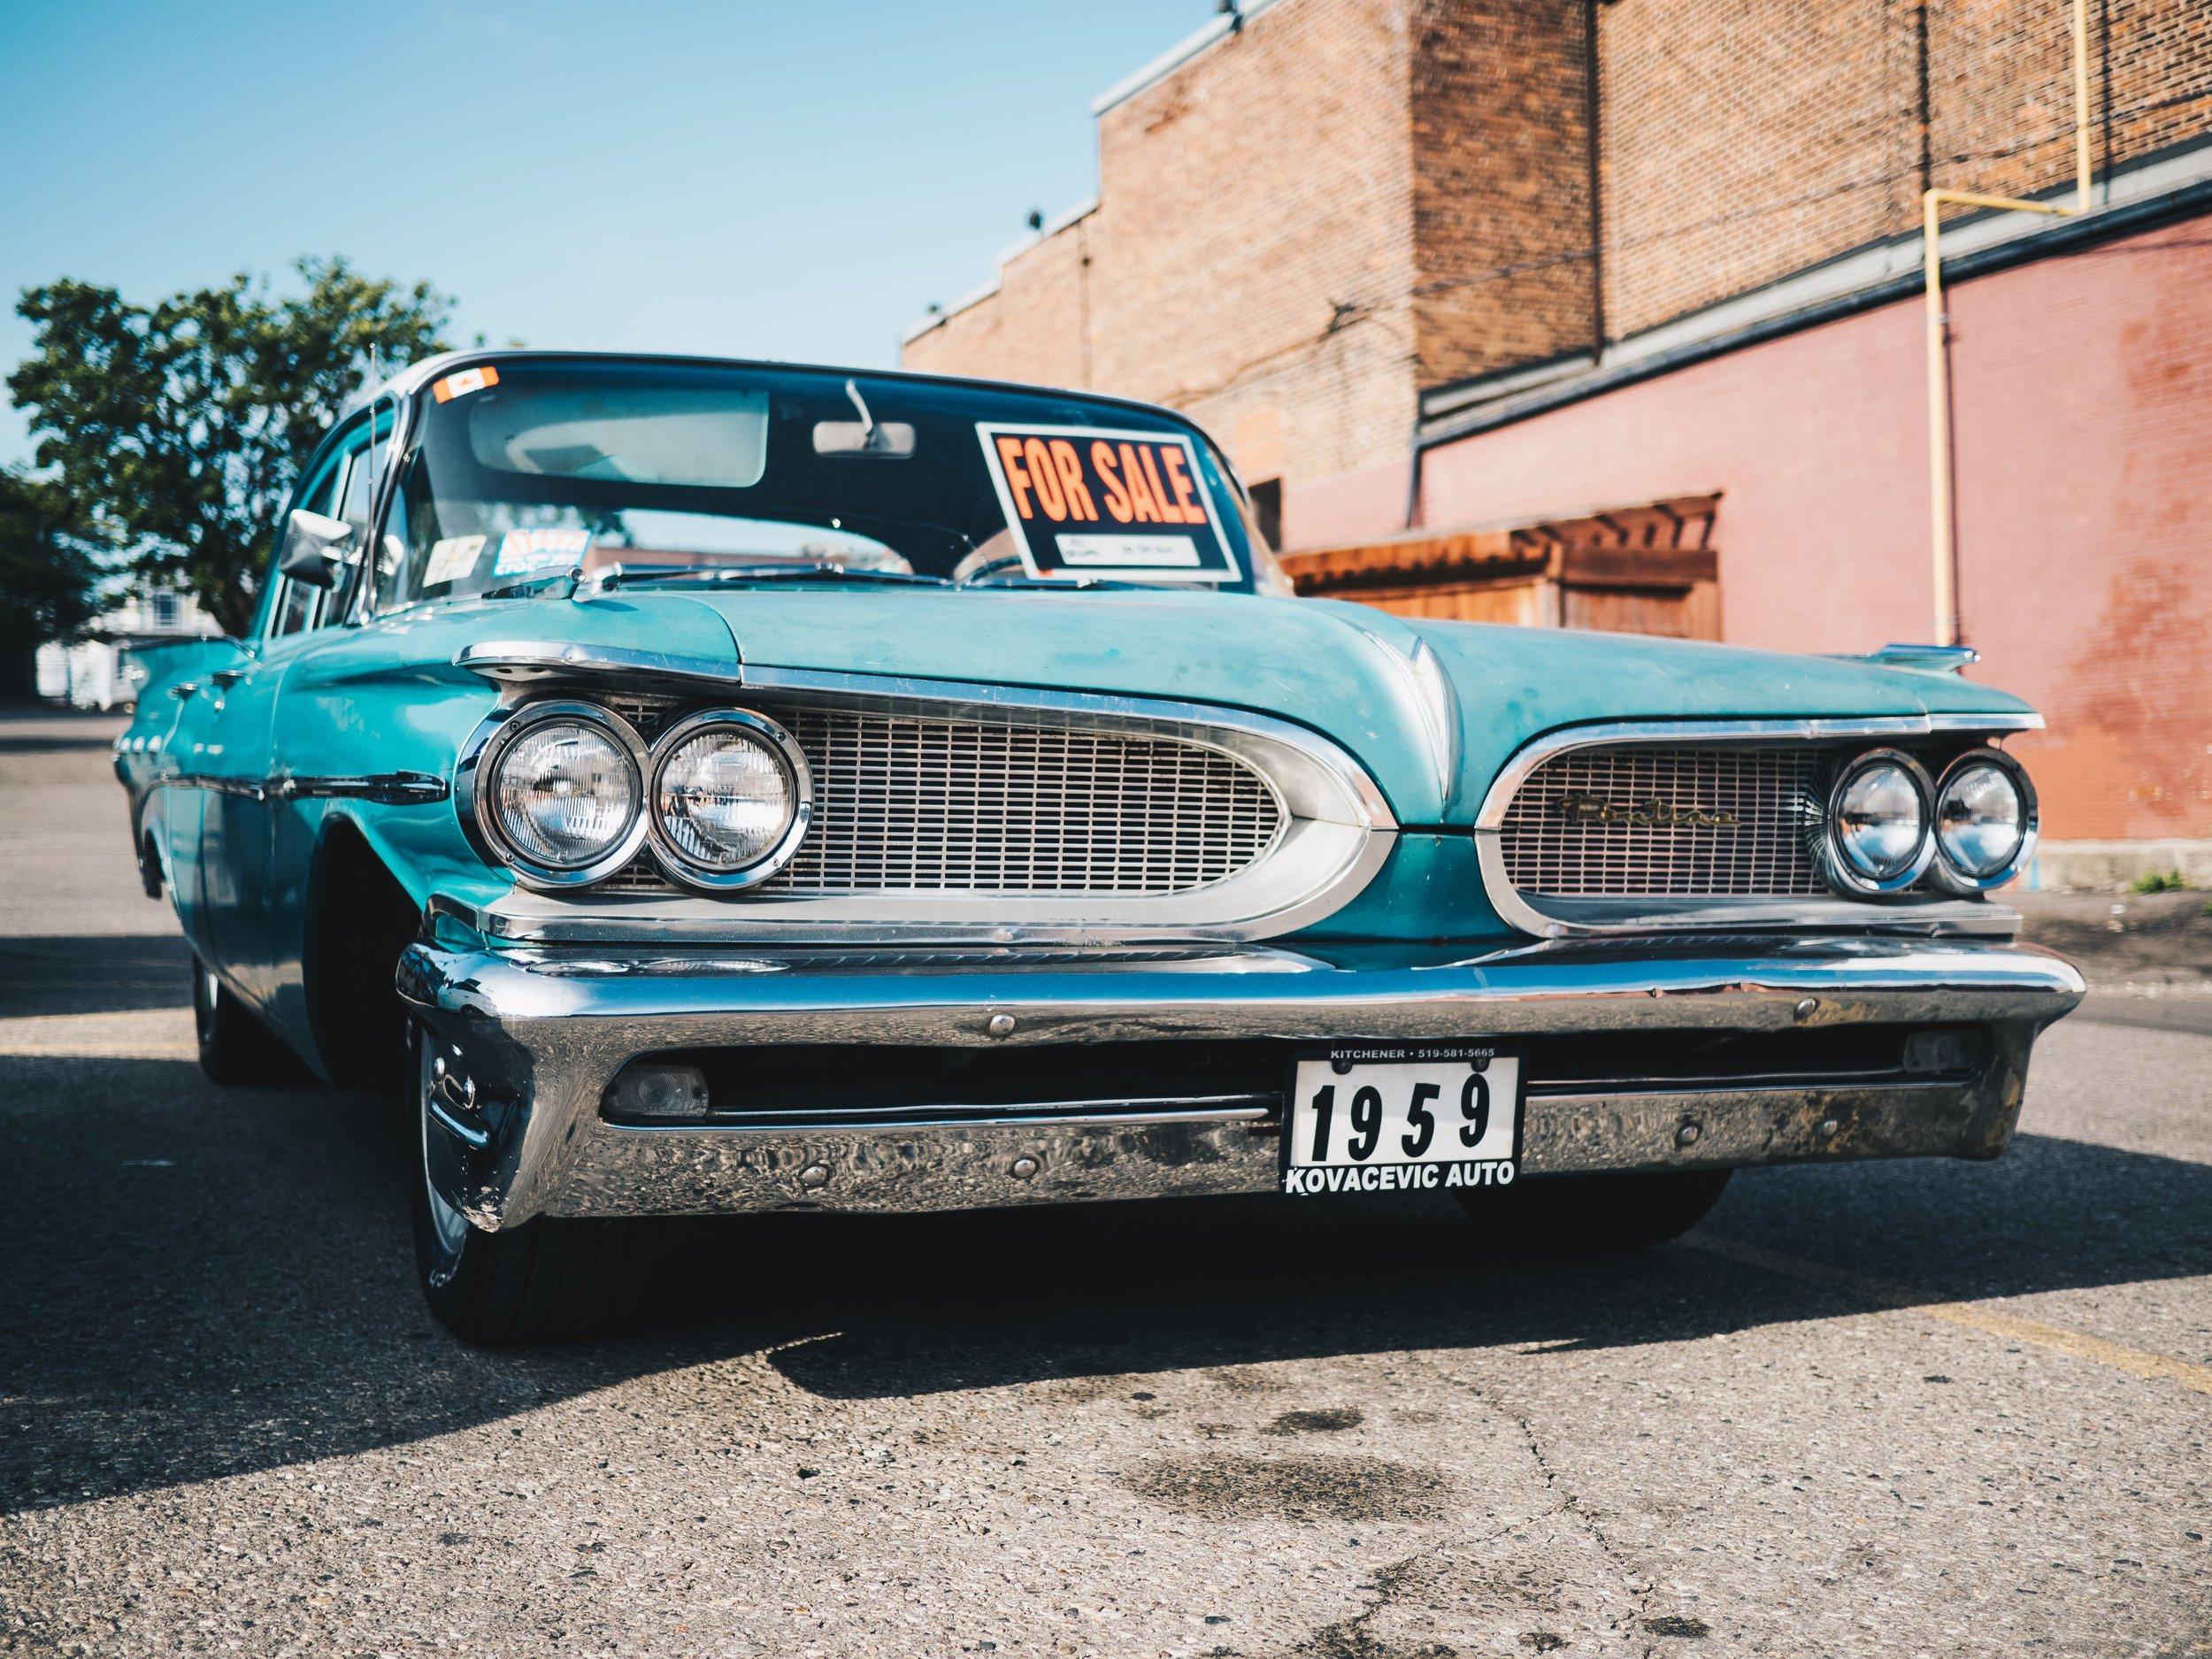 blue-car-for-sale.jpg